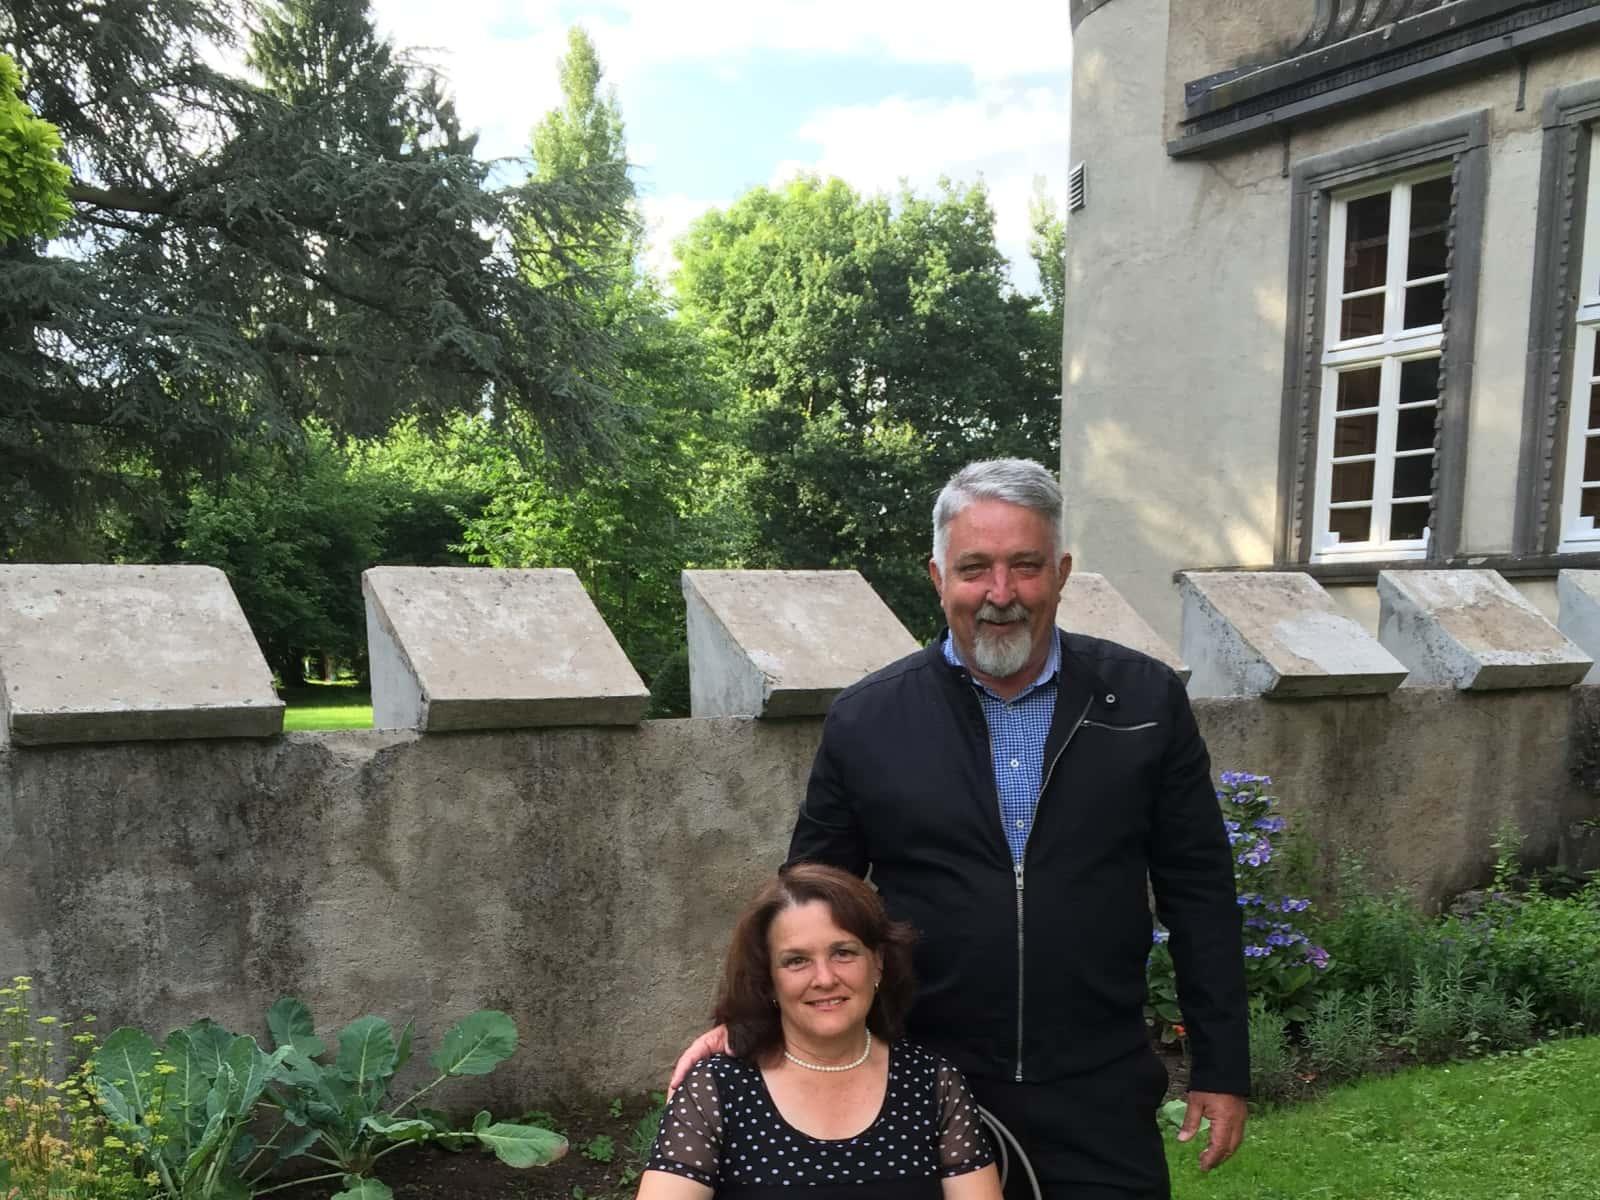 Bernie & Jenny from Belgian Gardens, Queensland, Australia